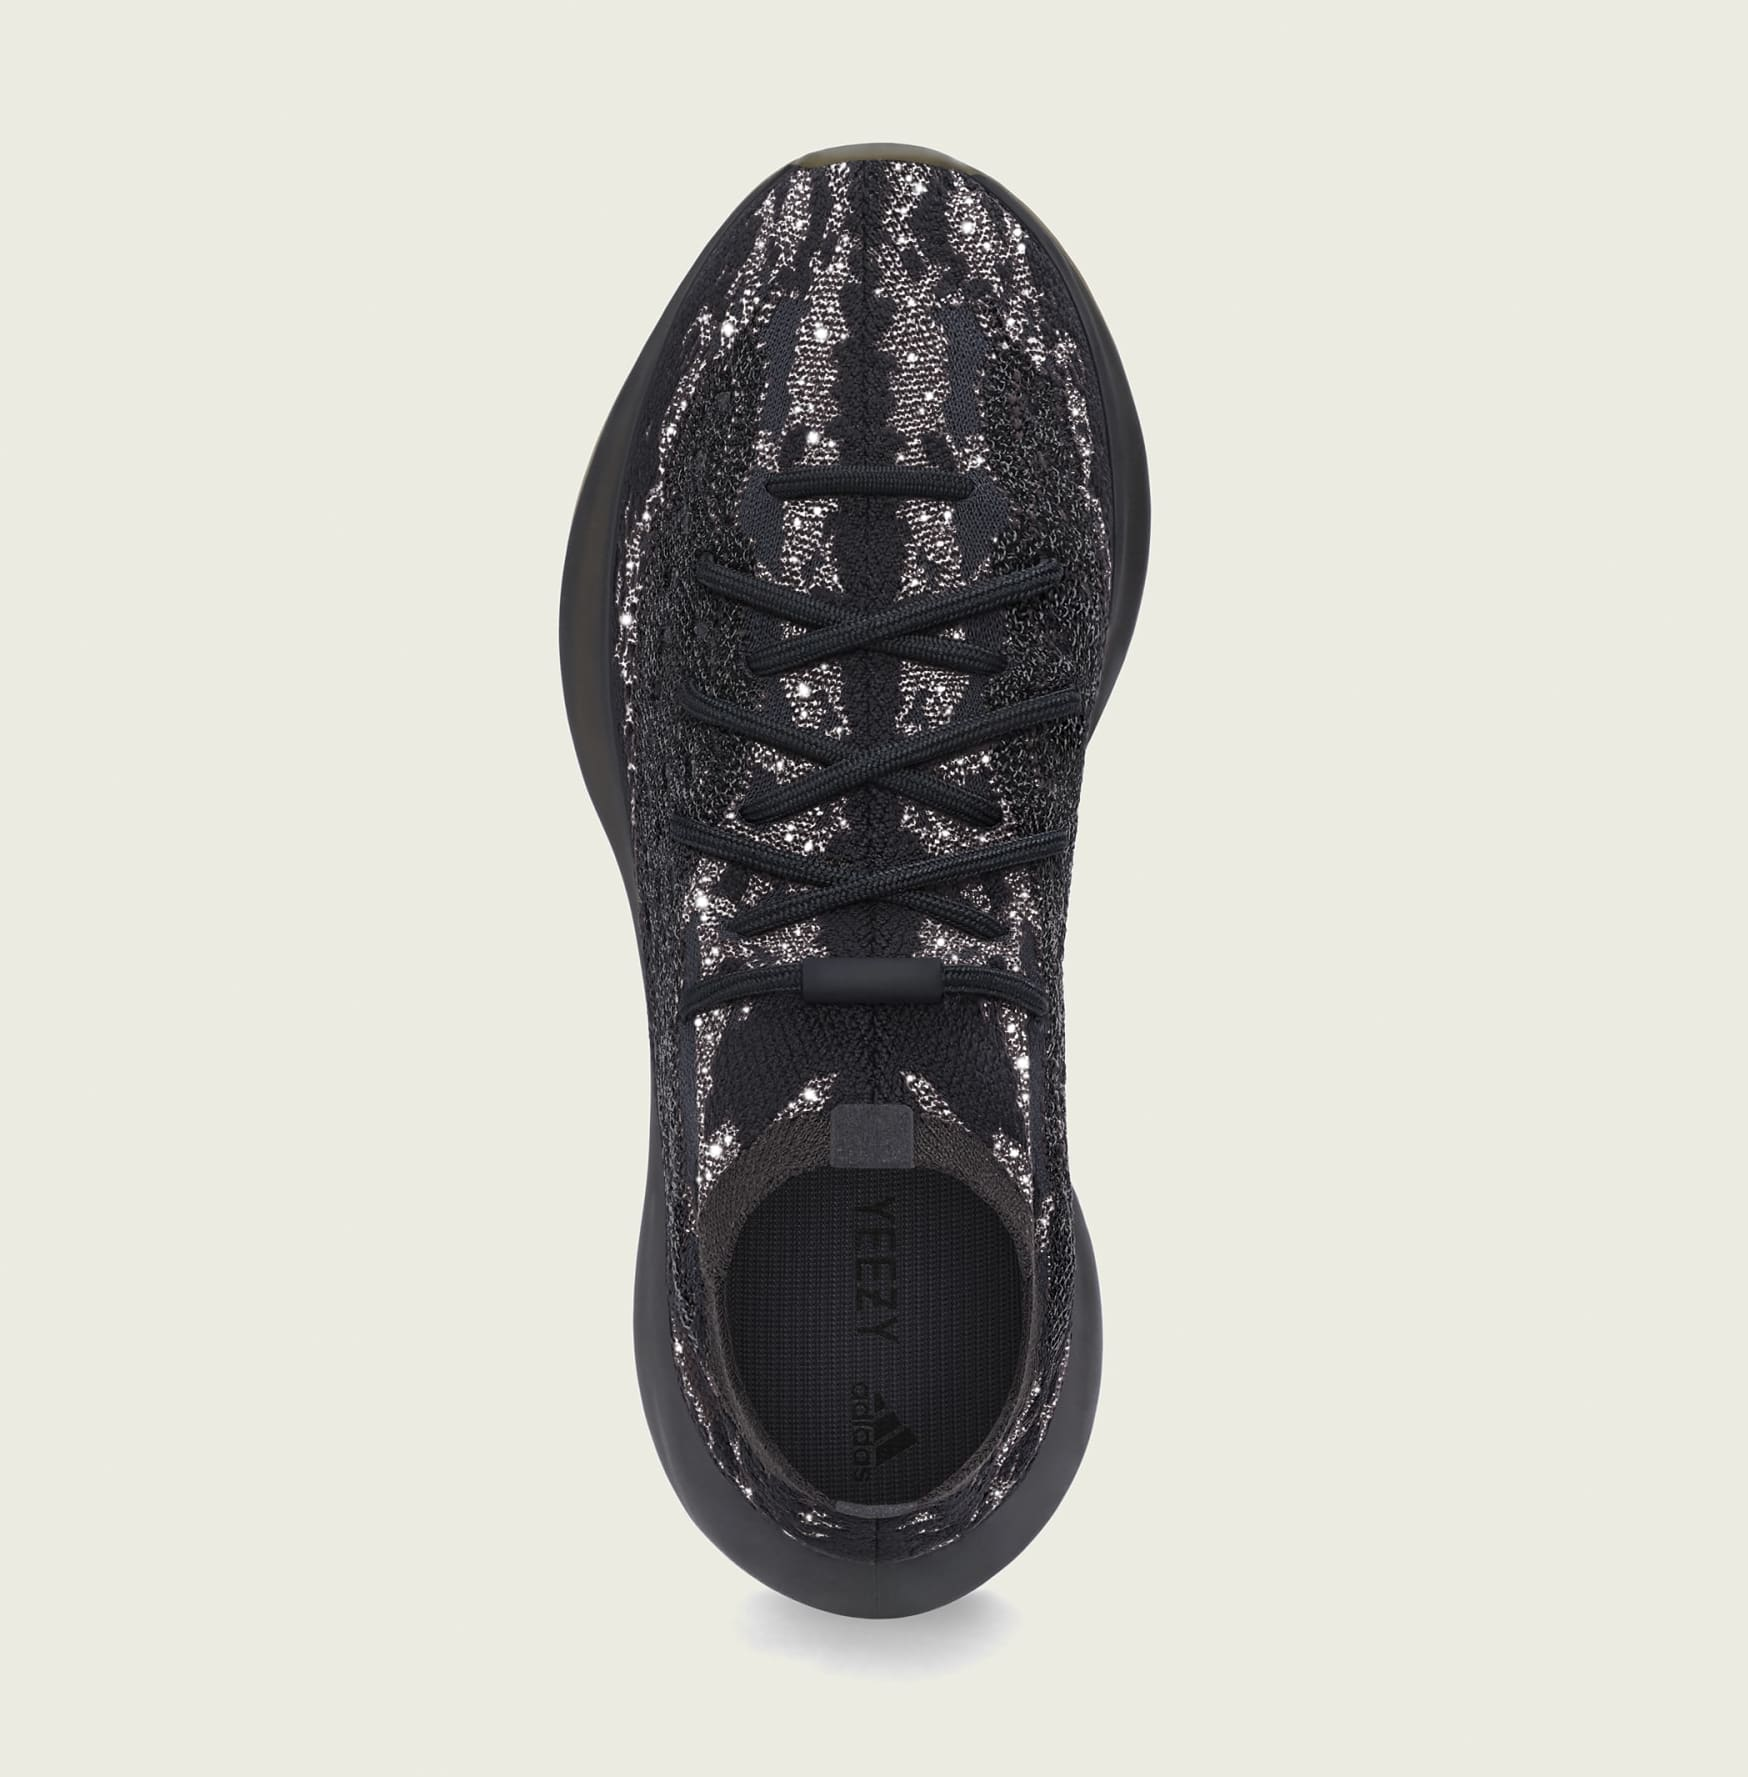 Adidas Yeezy Boost 380 'Onyx Reflective' H02536 Top